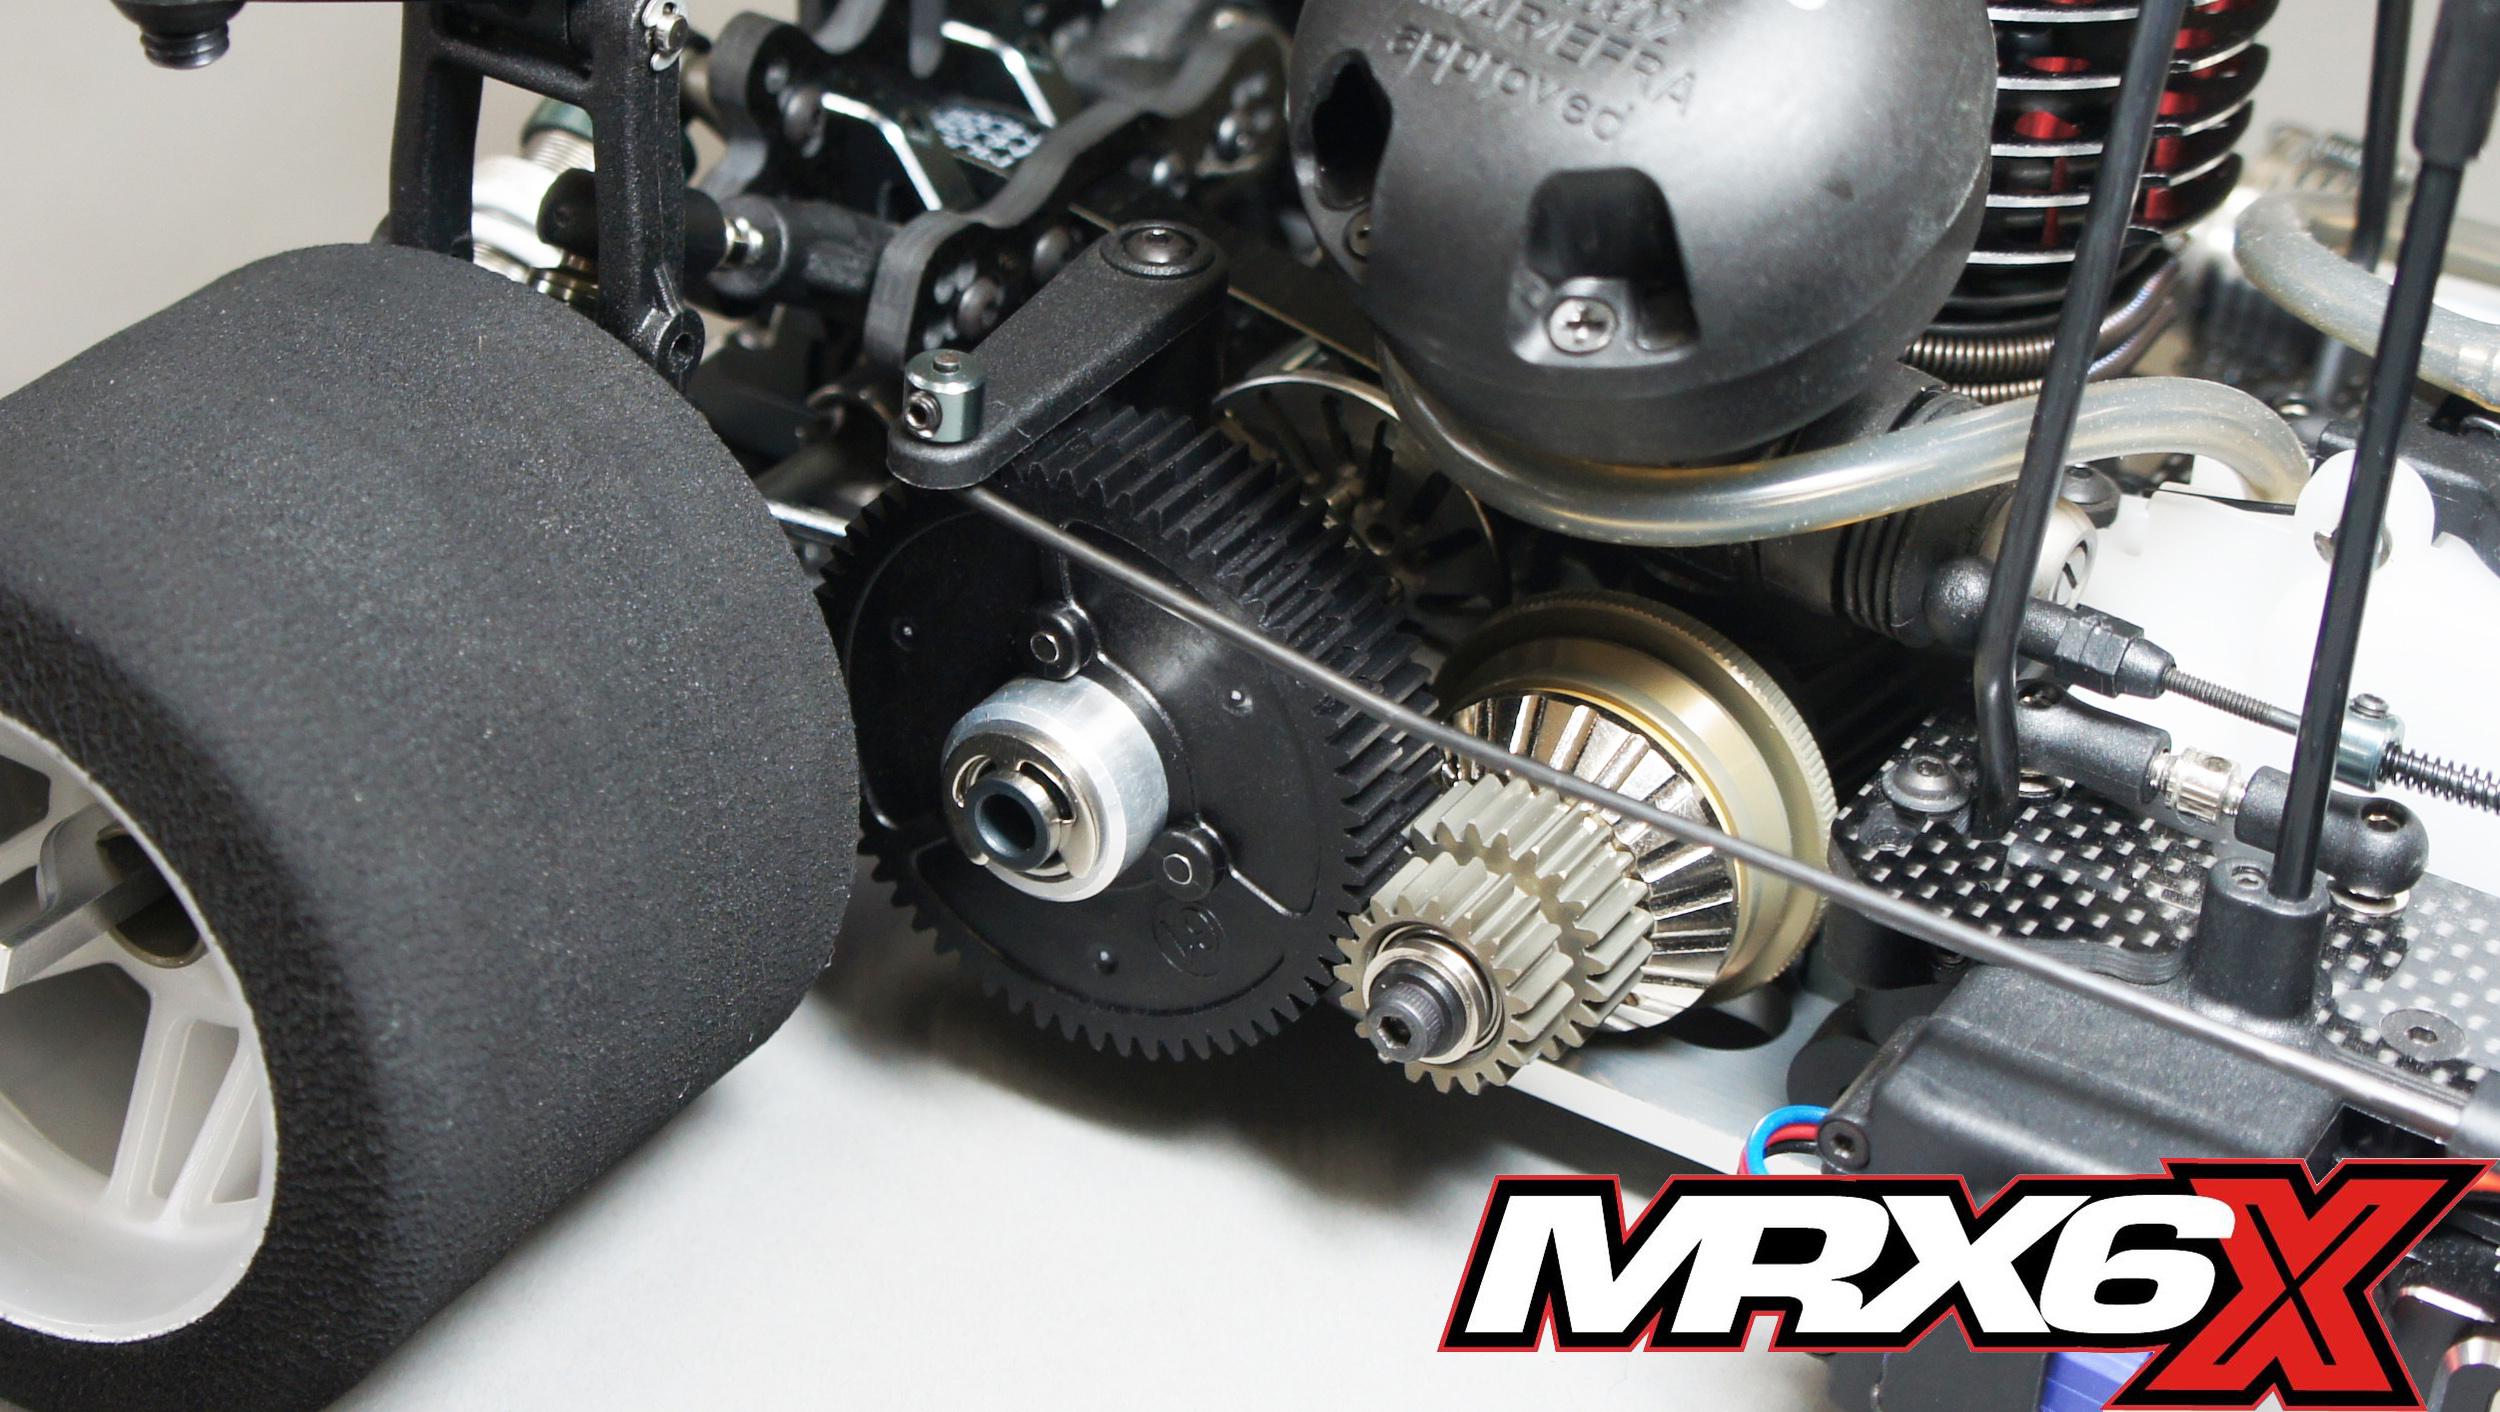 mrx6x-19-copy.jpg